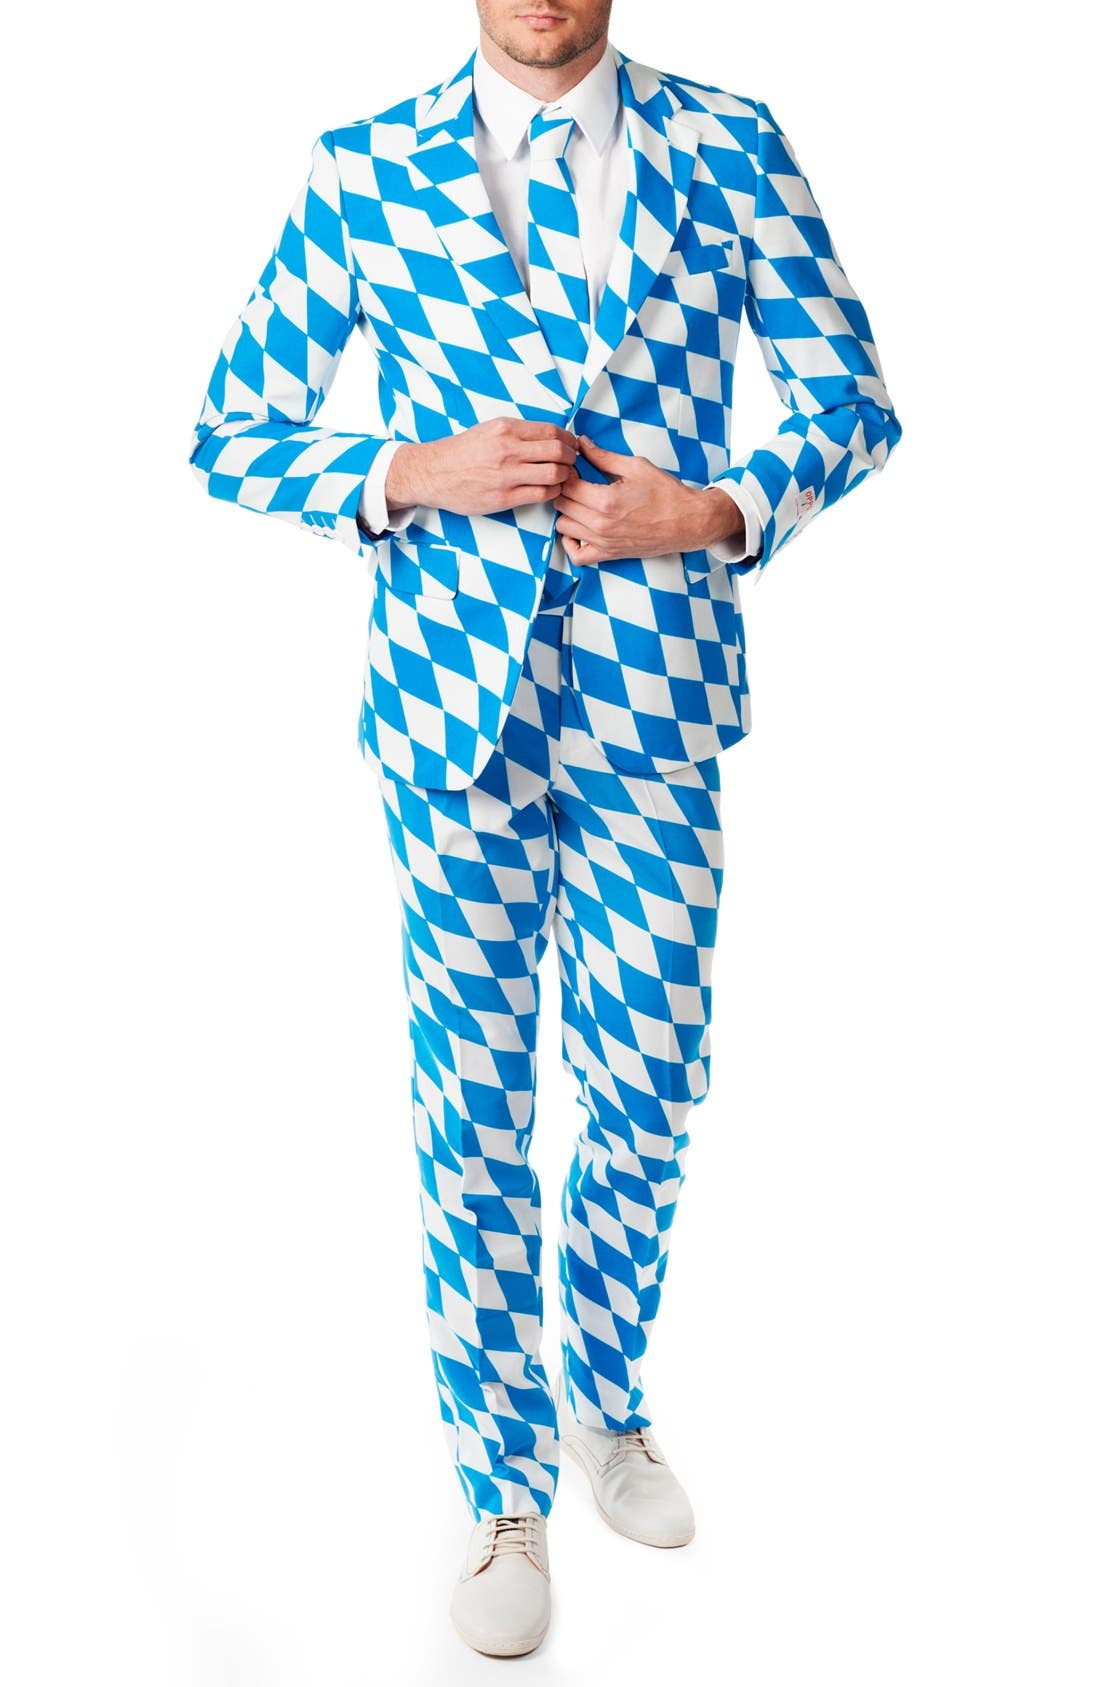 'The Bavarian' Trim Fit Suit with Tie,                             Main thumbnail 1, color,